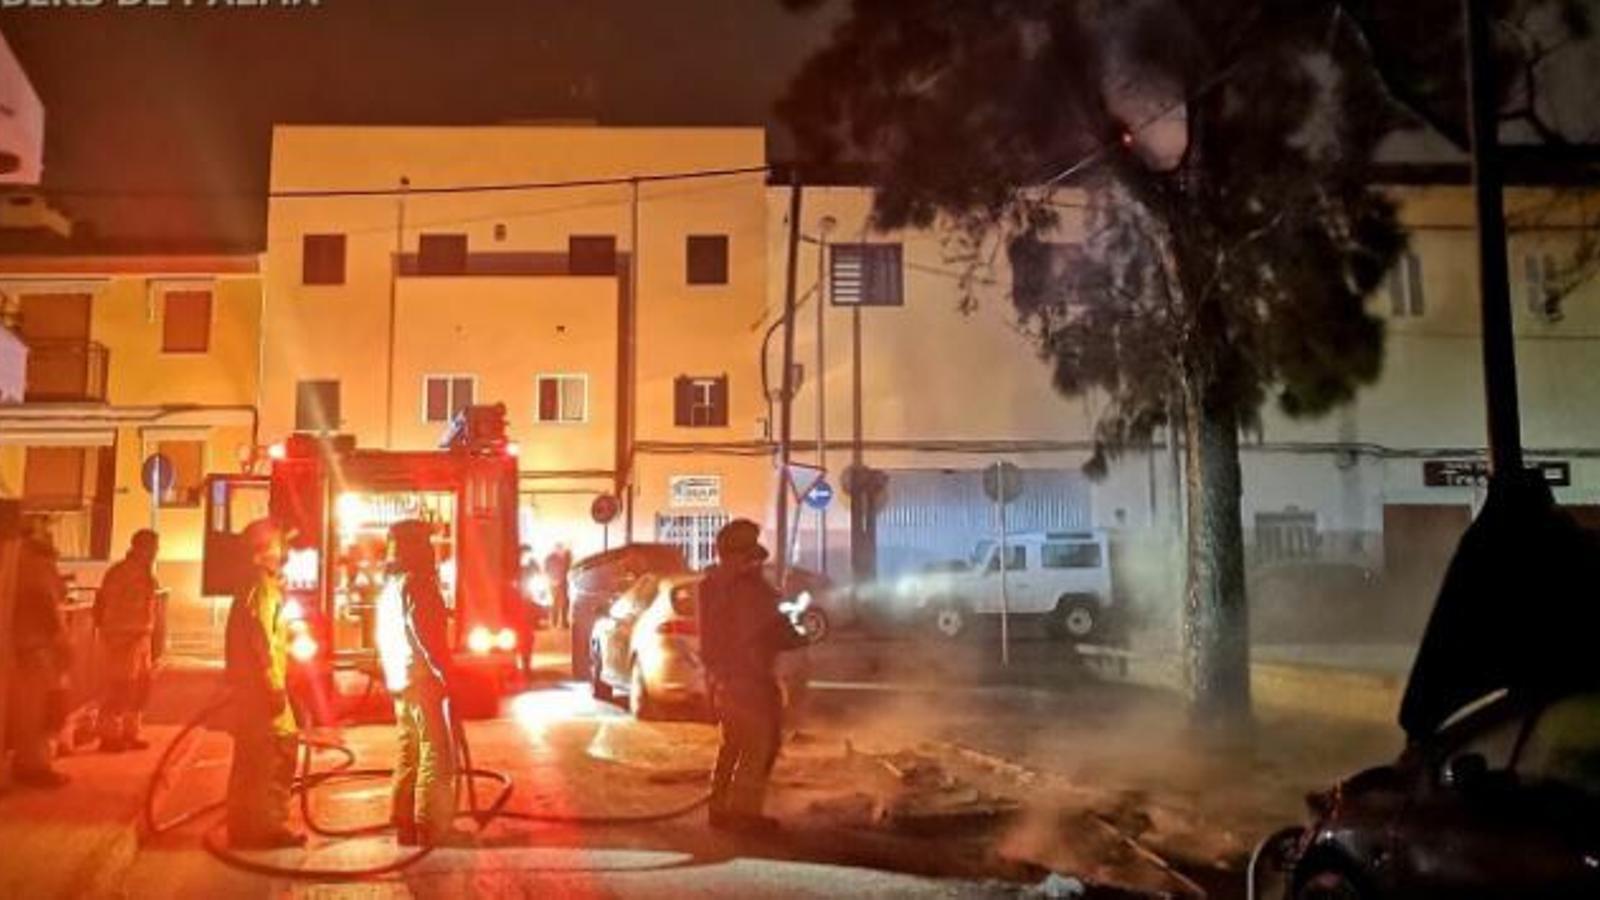 Imatge dels bombers apagant l'incendi. / BOMBERS DE PALMA